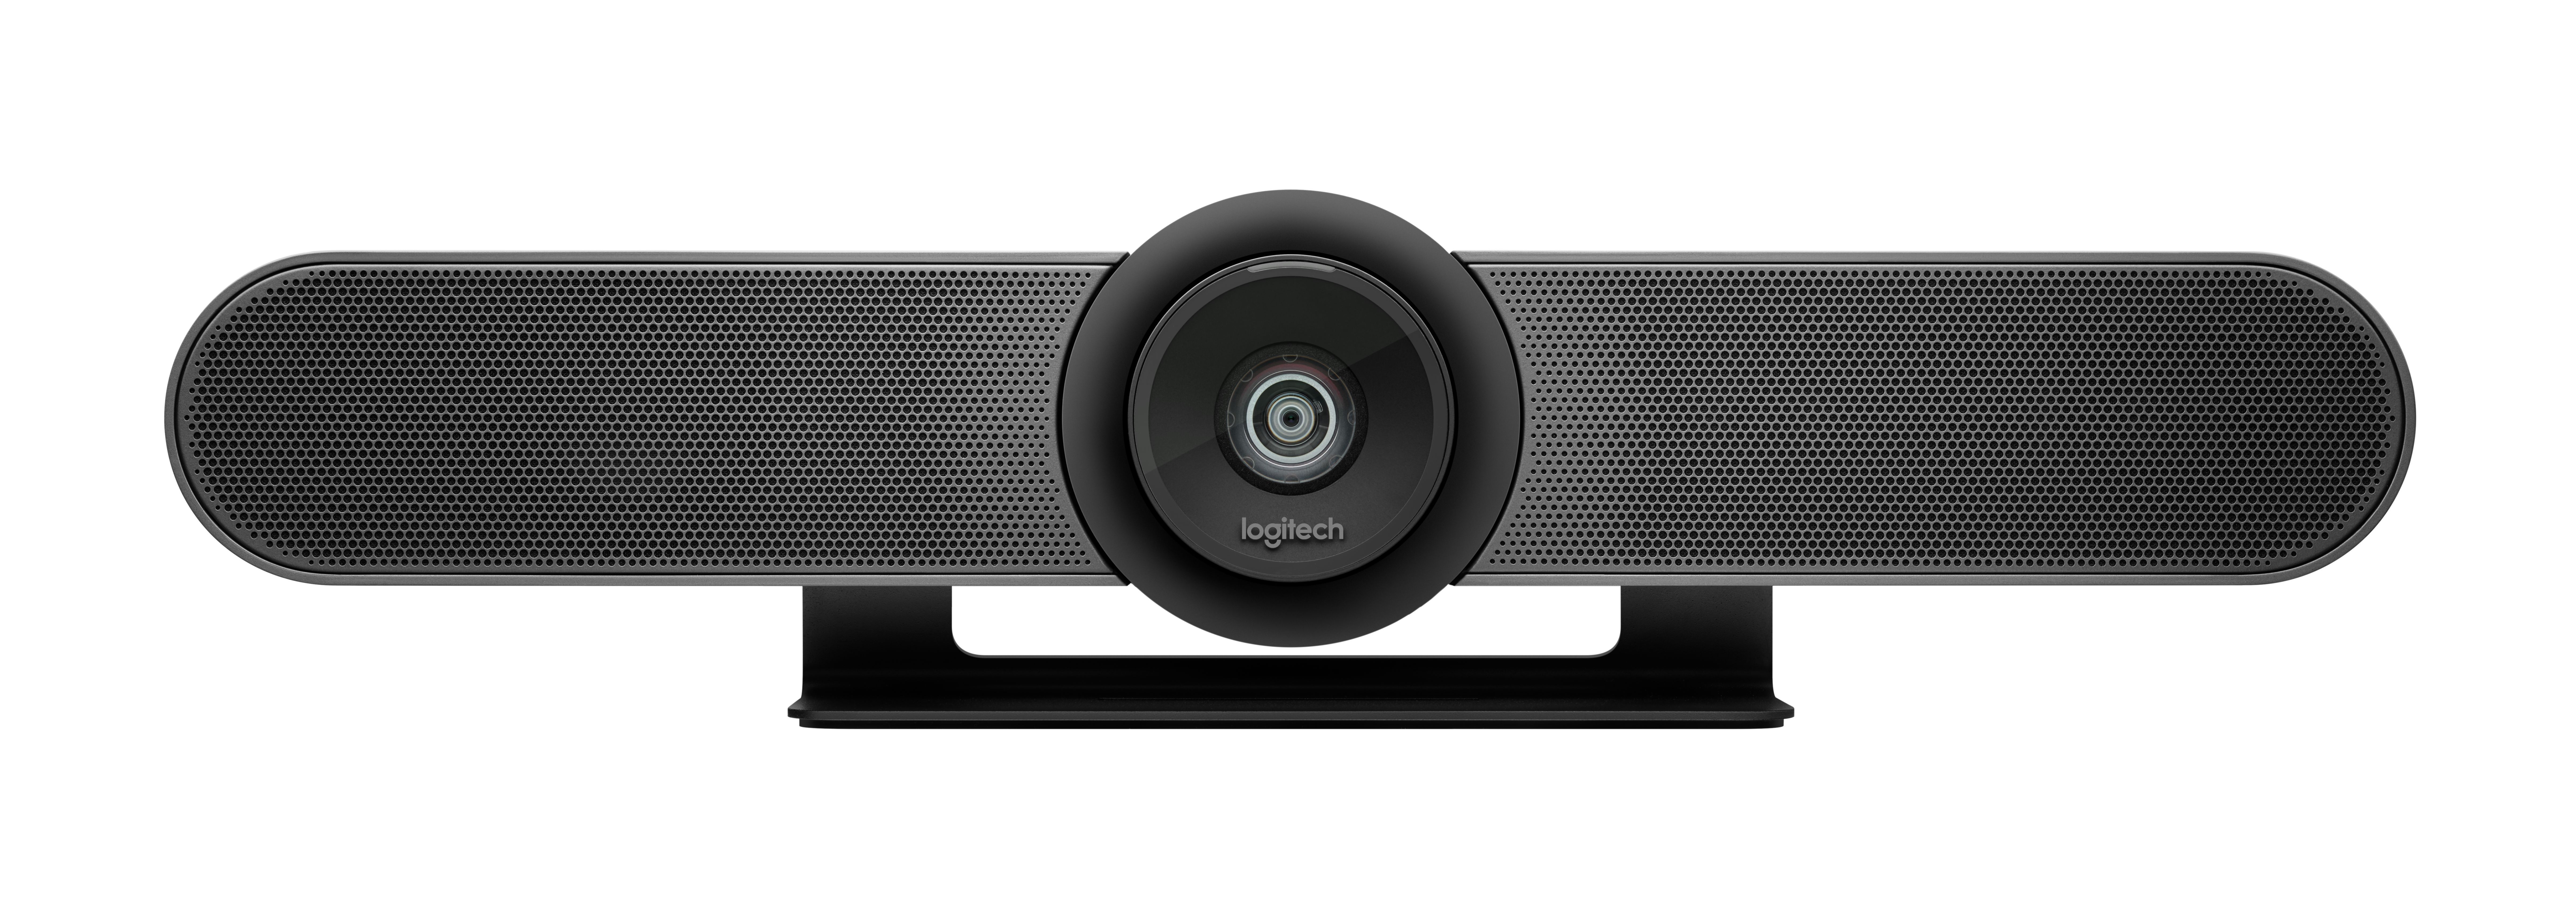 Logitech Introduces Premier Conference Camera for Huddle Rooms ...